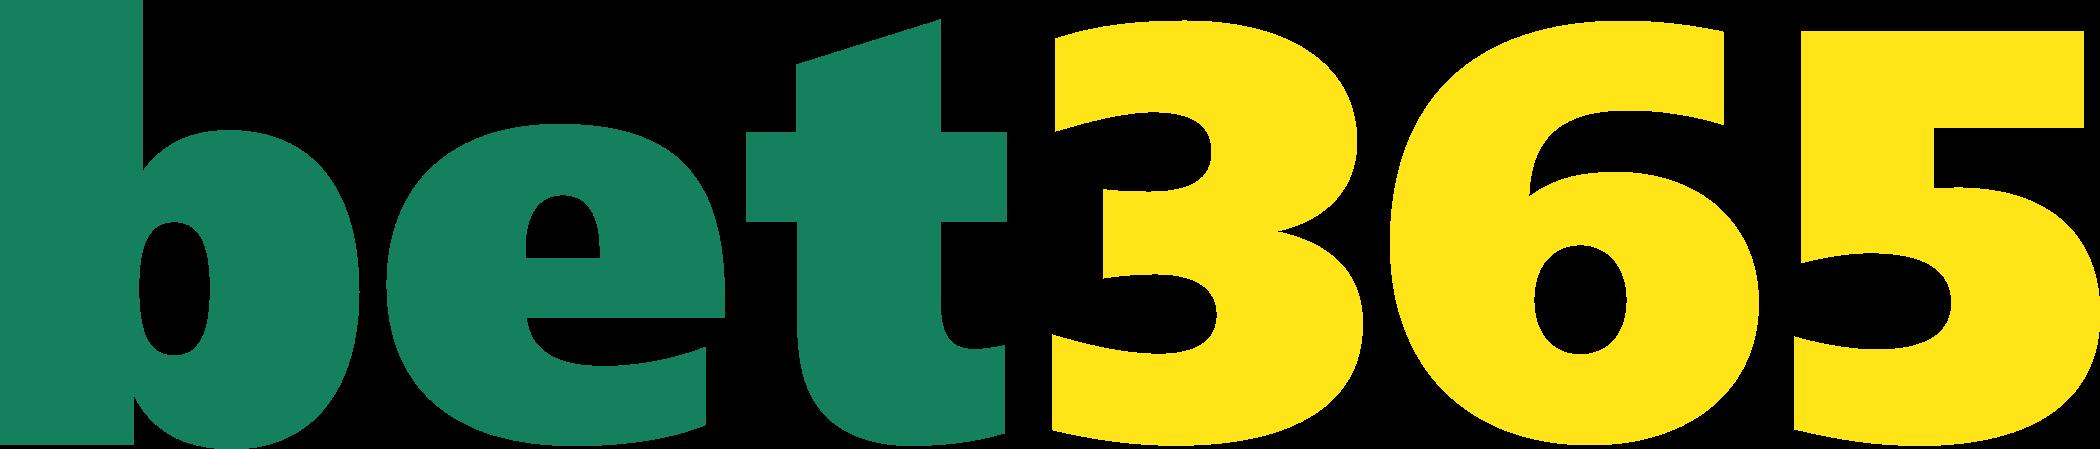 bet365 logo 1 1 - bet365 Logo